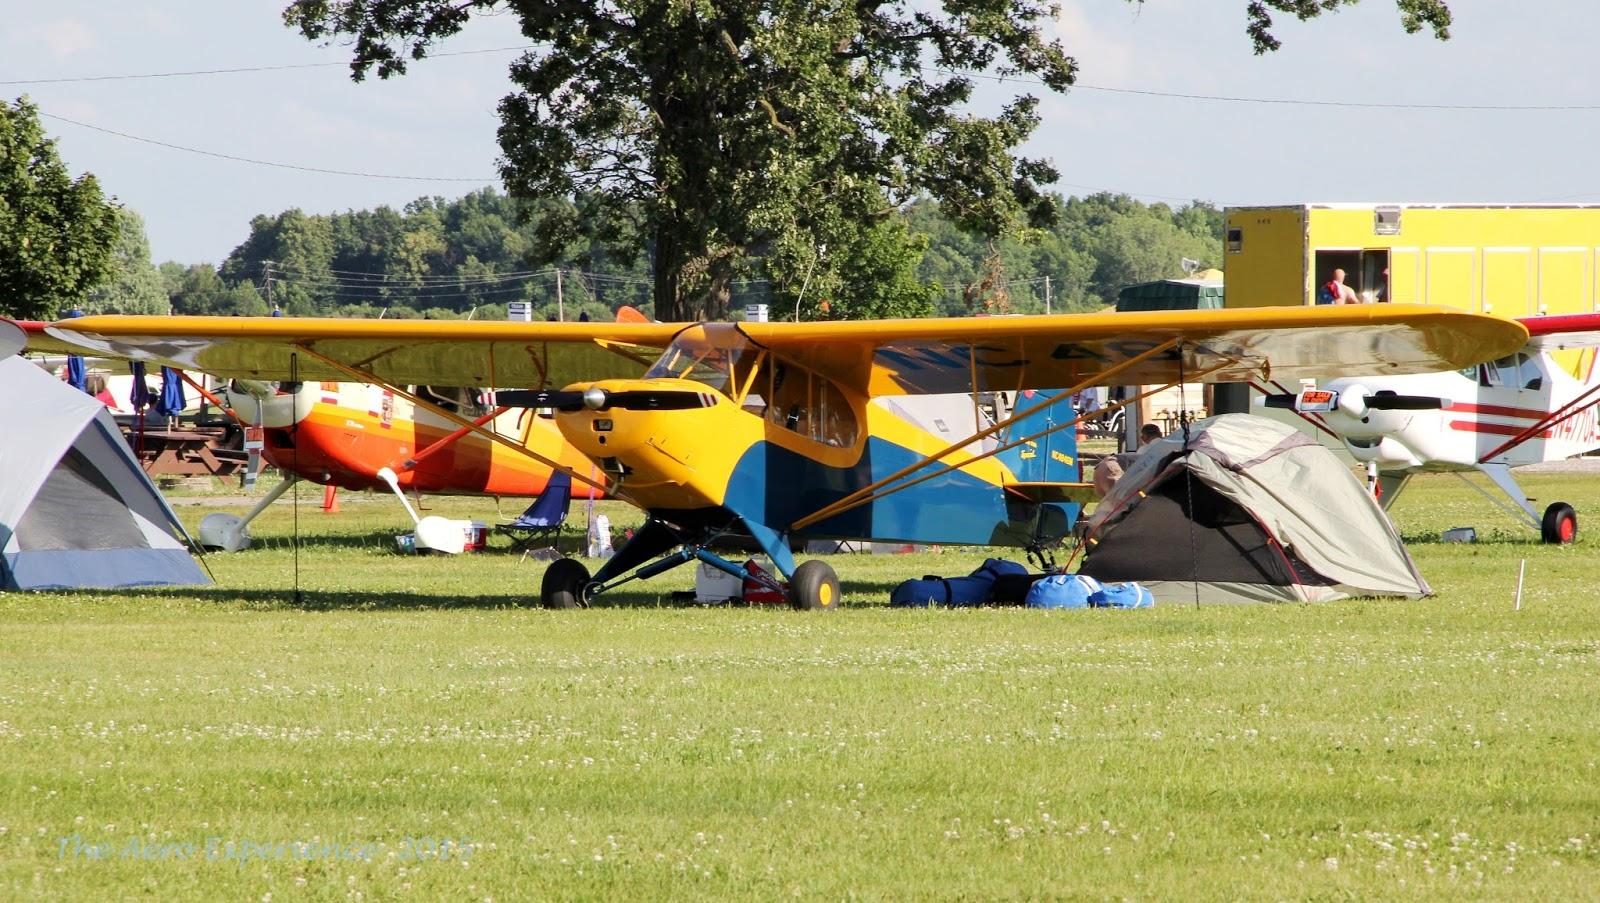 The Aero Experience: EAA AirVenture Oshkosh 2015: Vintage